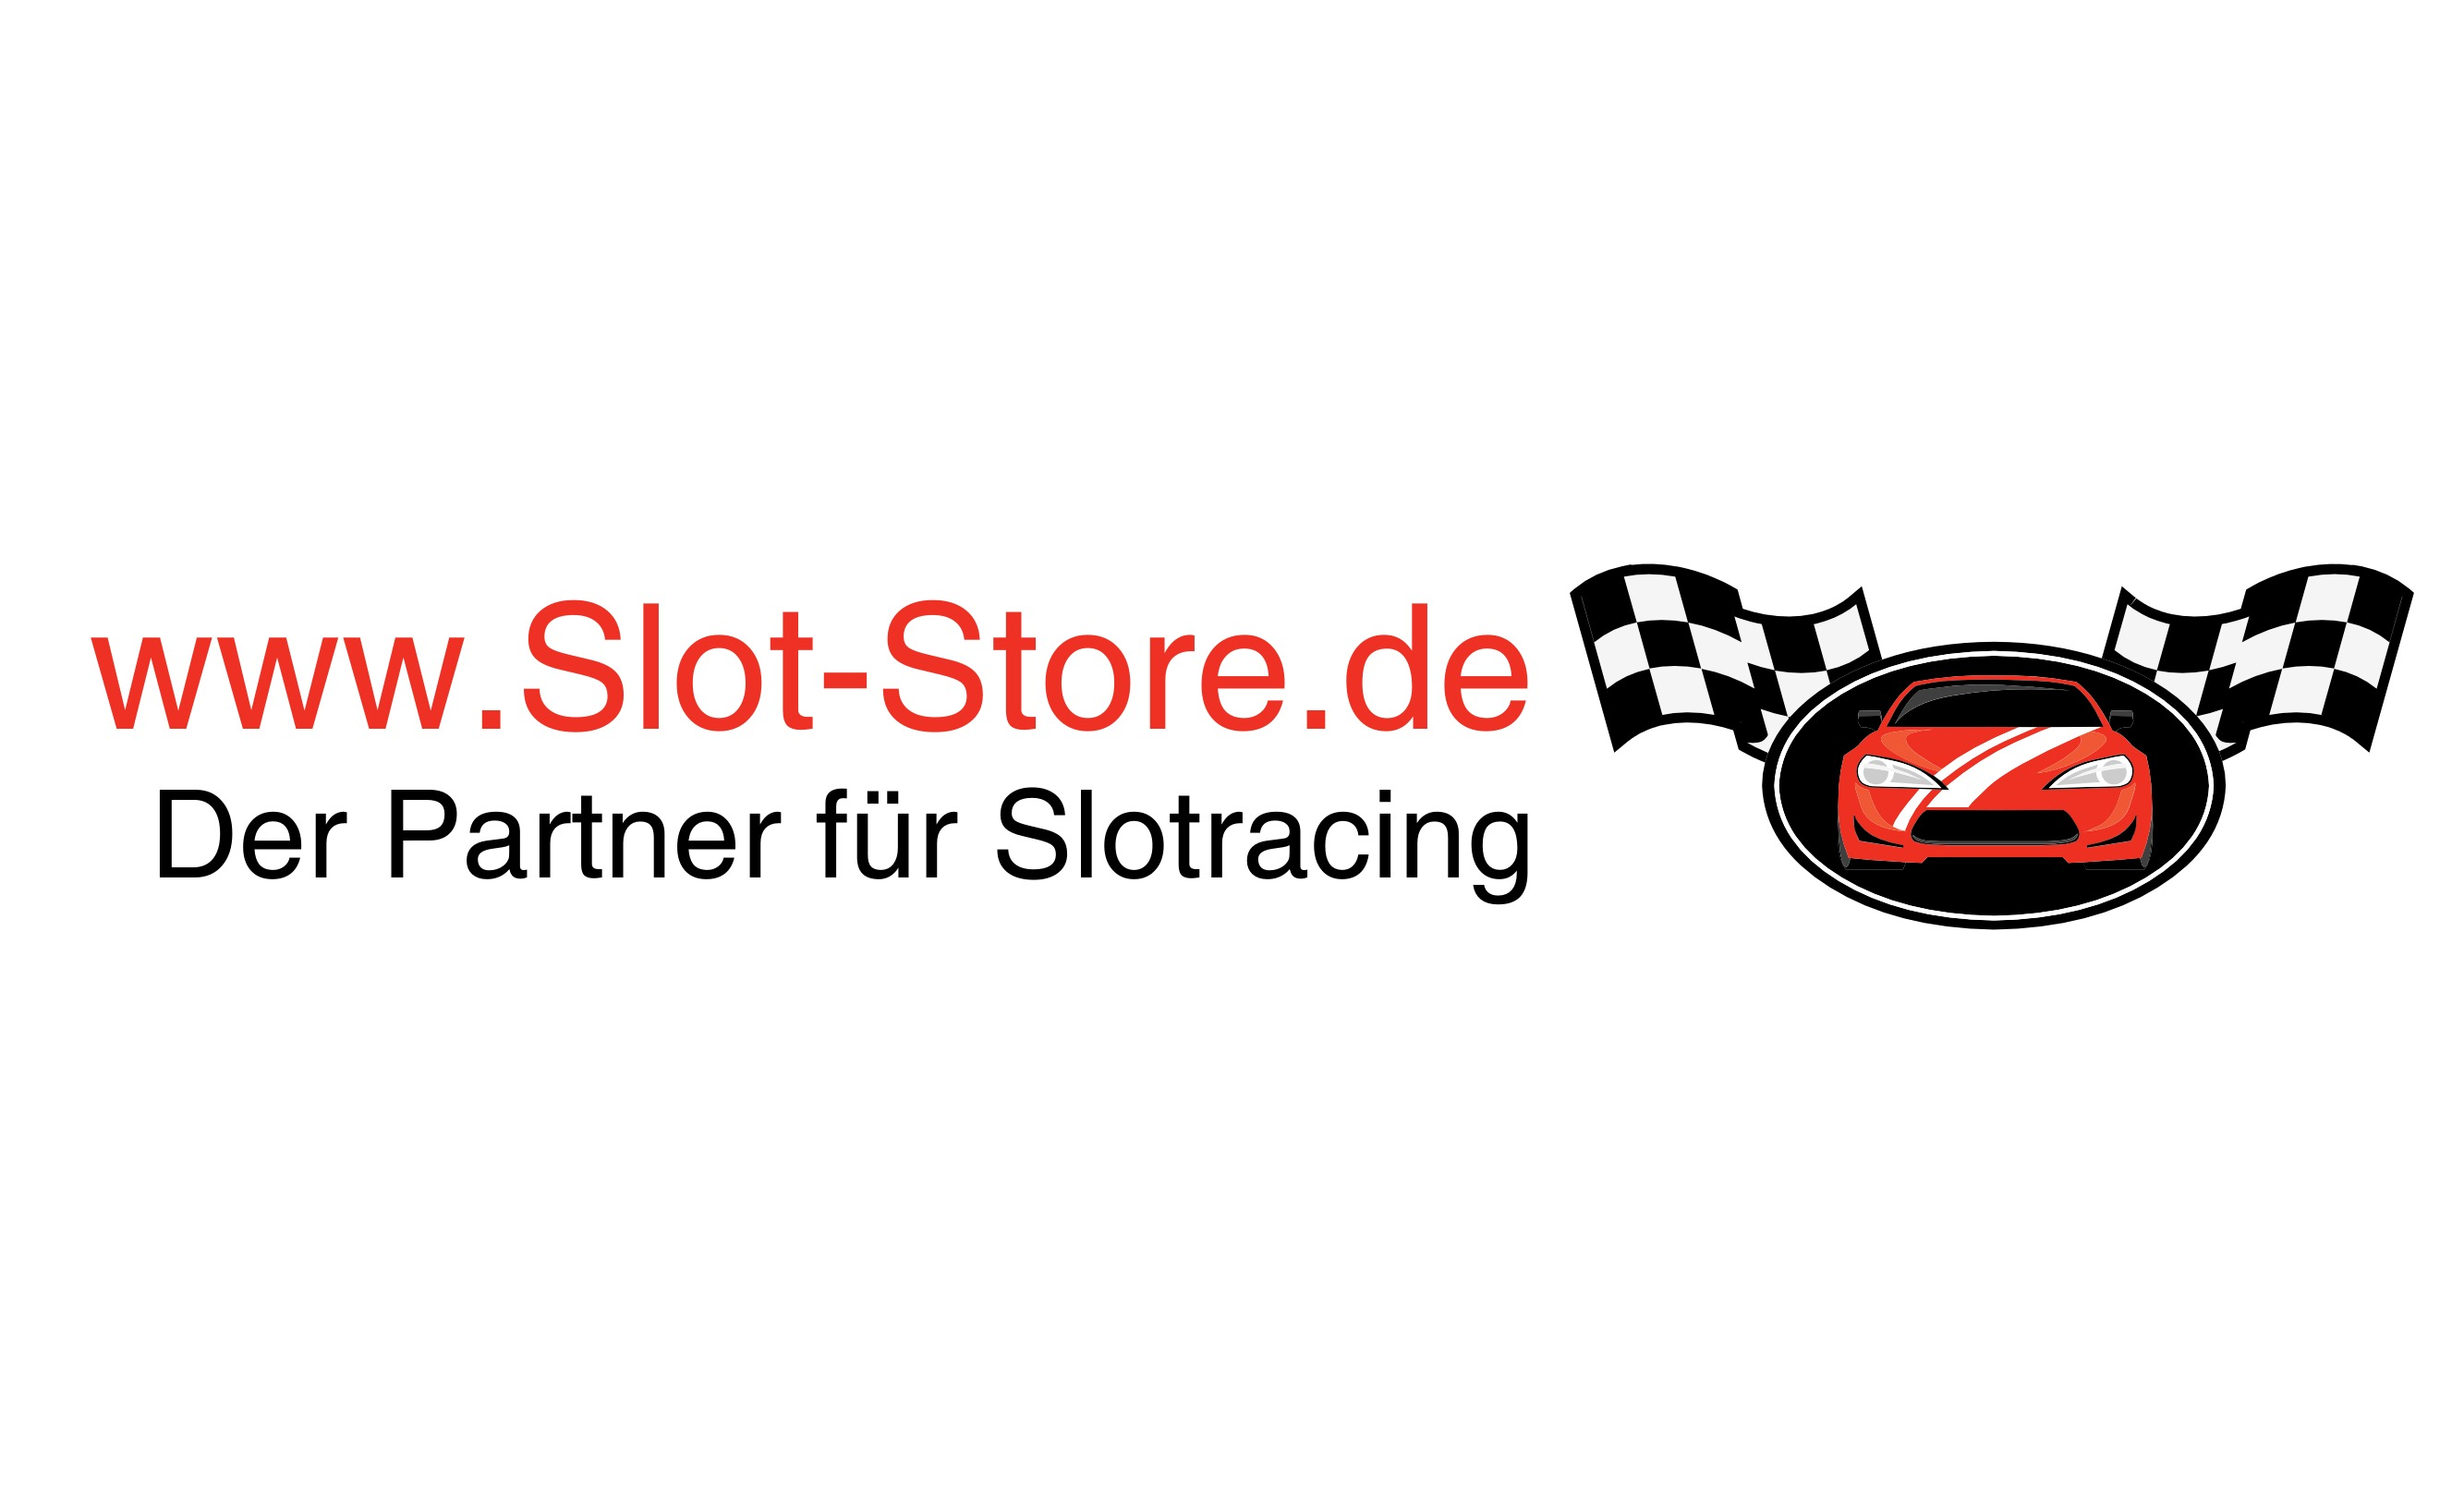 Slot-Store